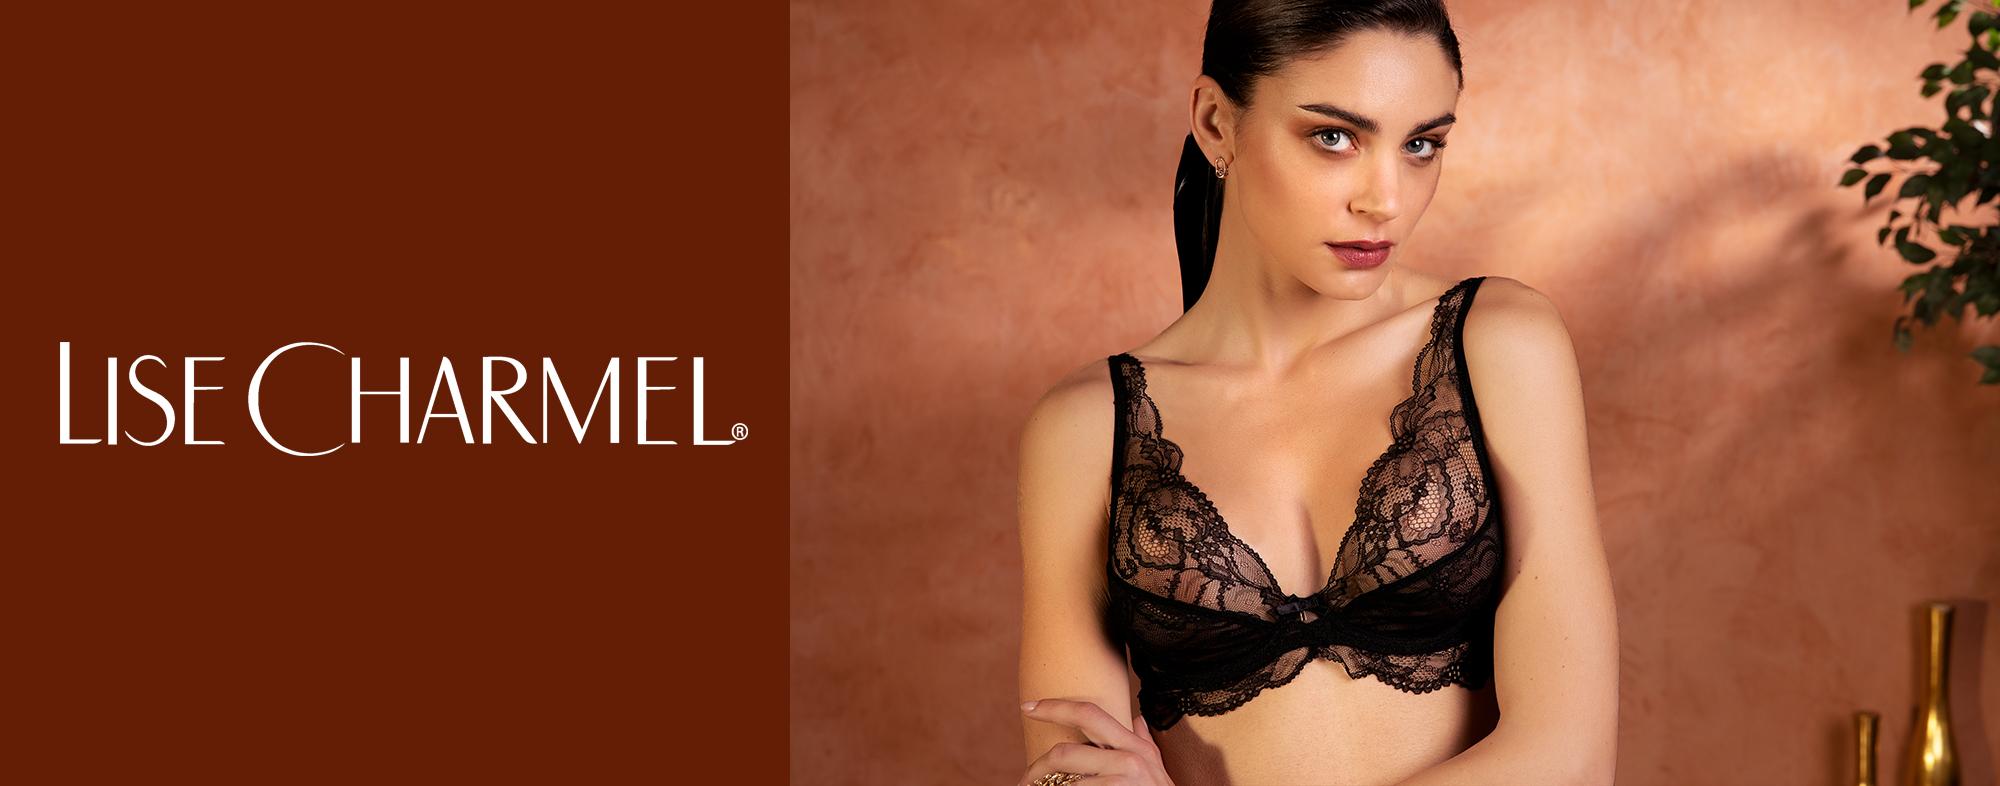 Lise Charmel - Soir de Venise